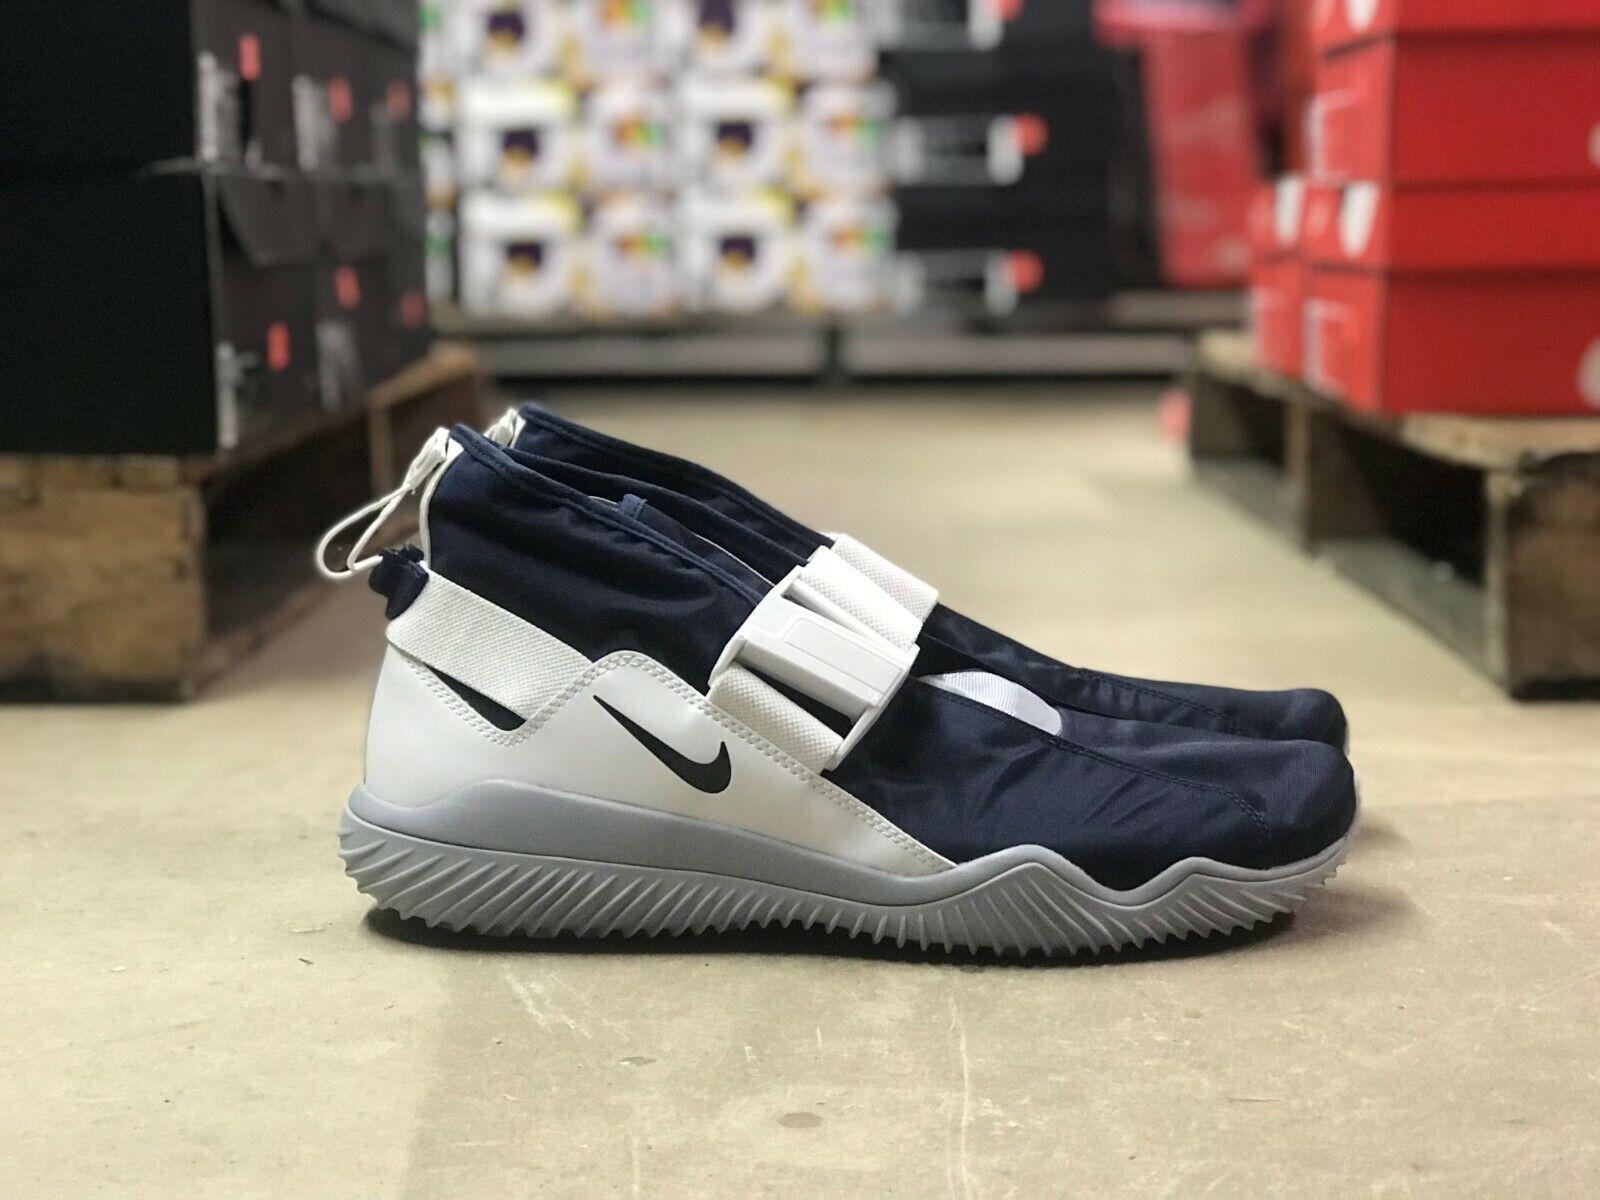 Nike Komyuter herr Laceless Athletic Athletic Athletic skor blå  vit AA2211 400 ny Storlek 12.5  på billigt